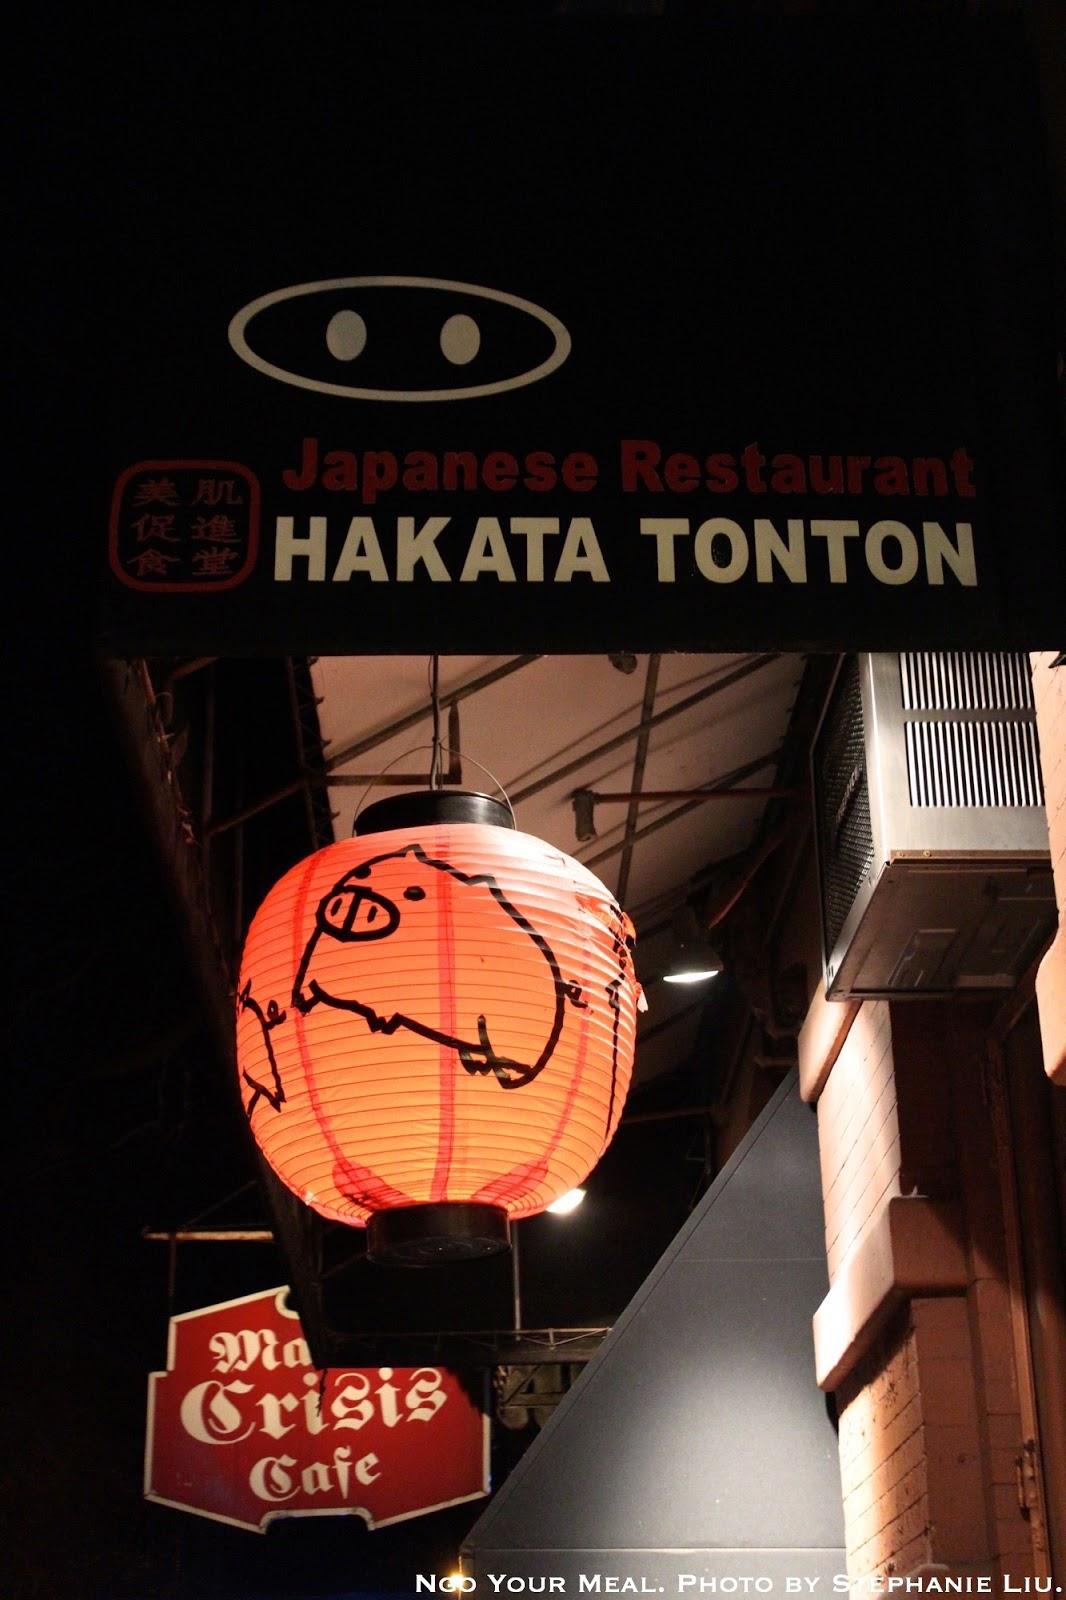 Hakata Tonton